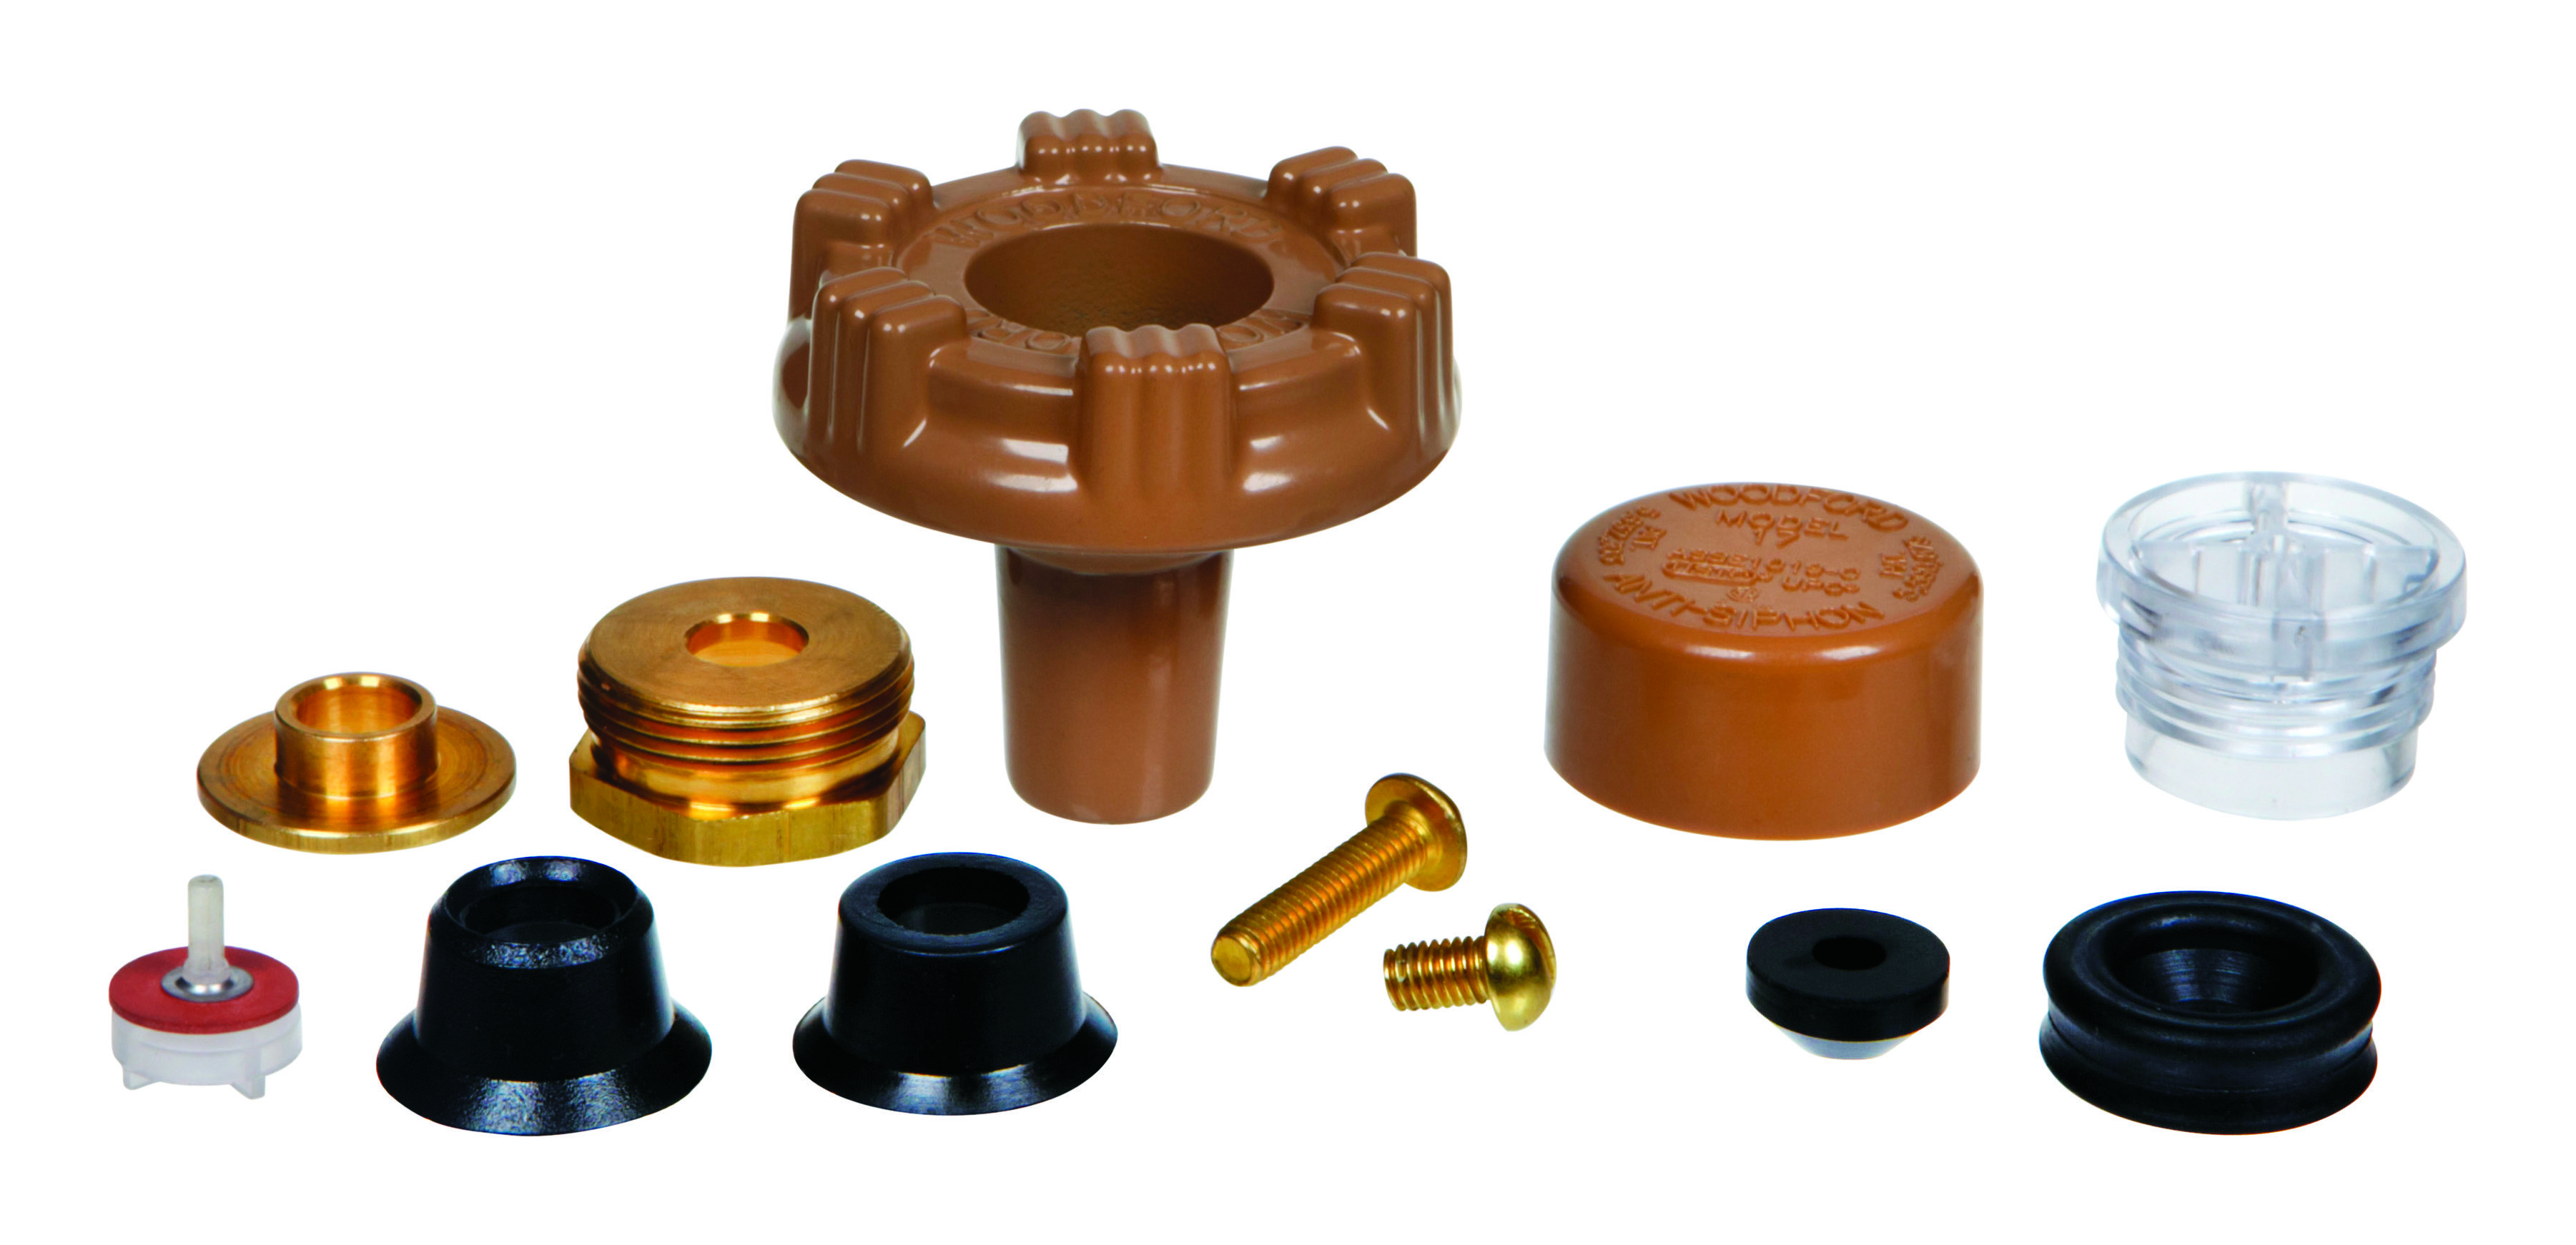 Woodford Brass Hydrant Repair Kit Ebay